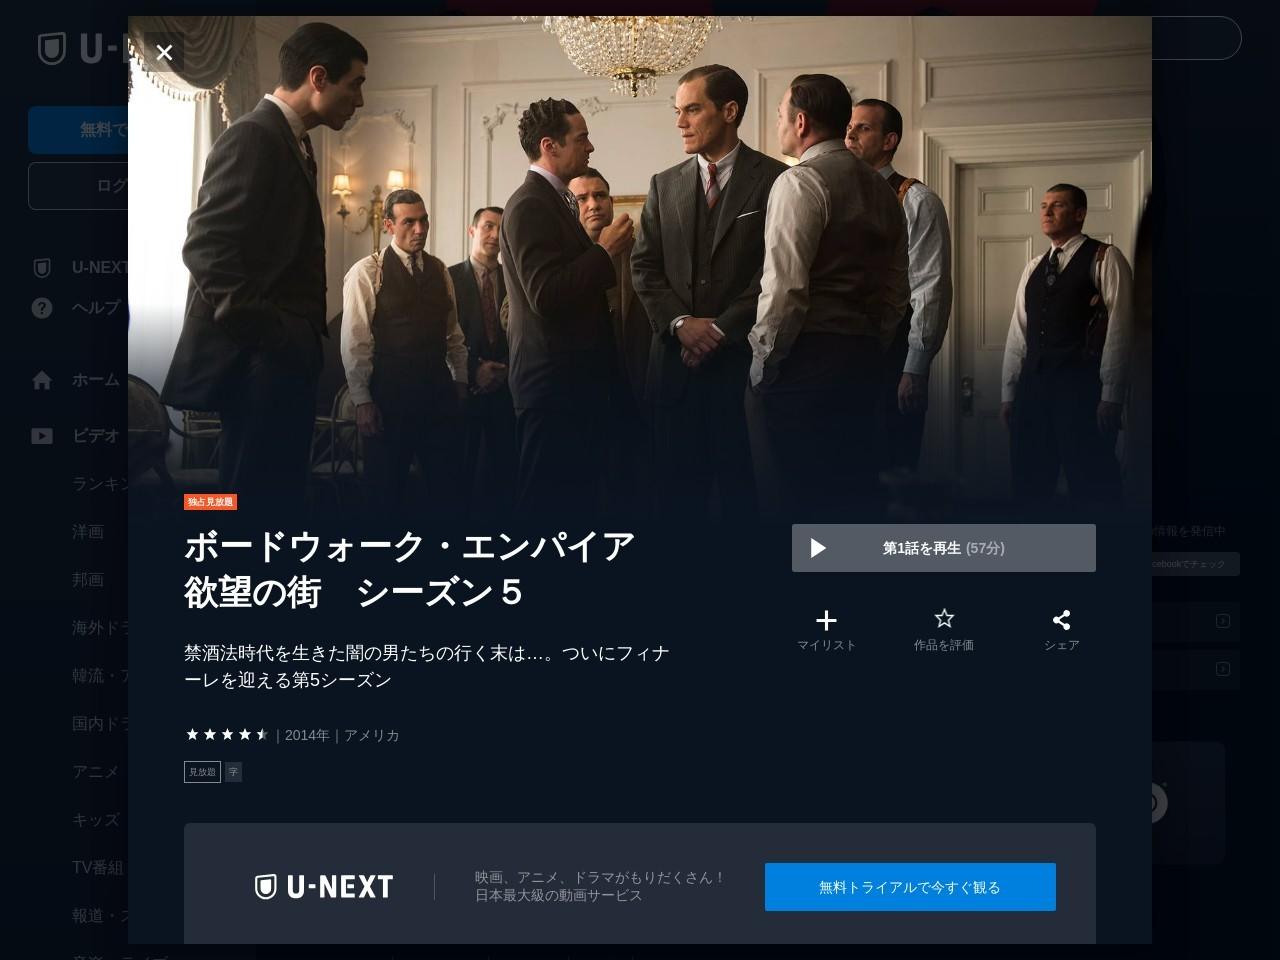 U-NEXTは見放題作品数NO.1の動画サービスです